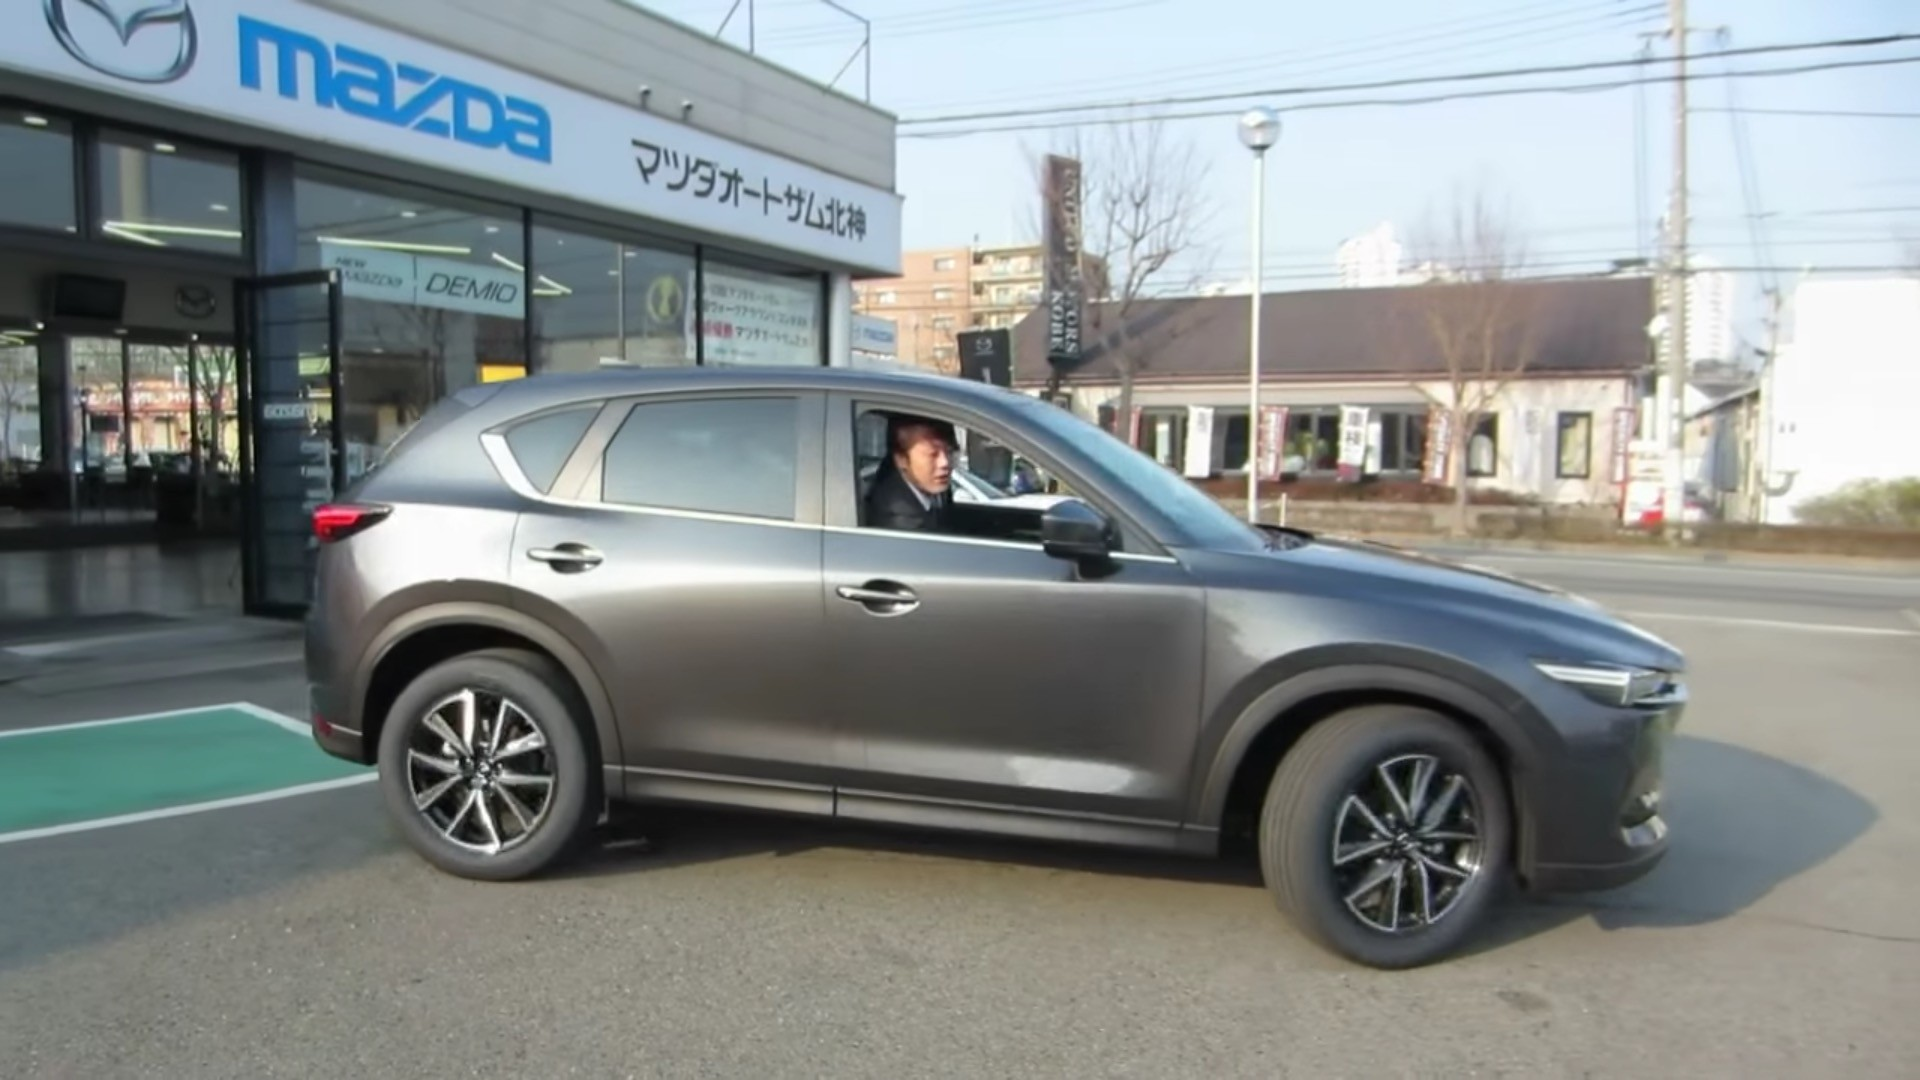 https://s1.cdn.autoevolution.com/images/news/gallery/cx-5-japanese-dealers_5.jpg